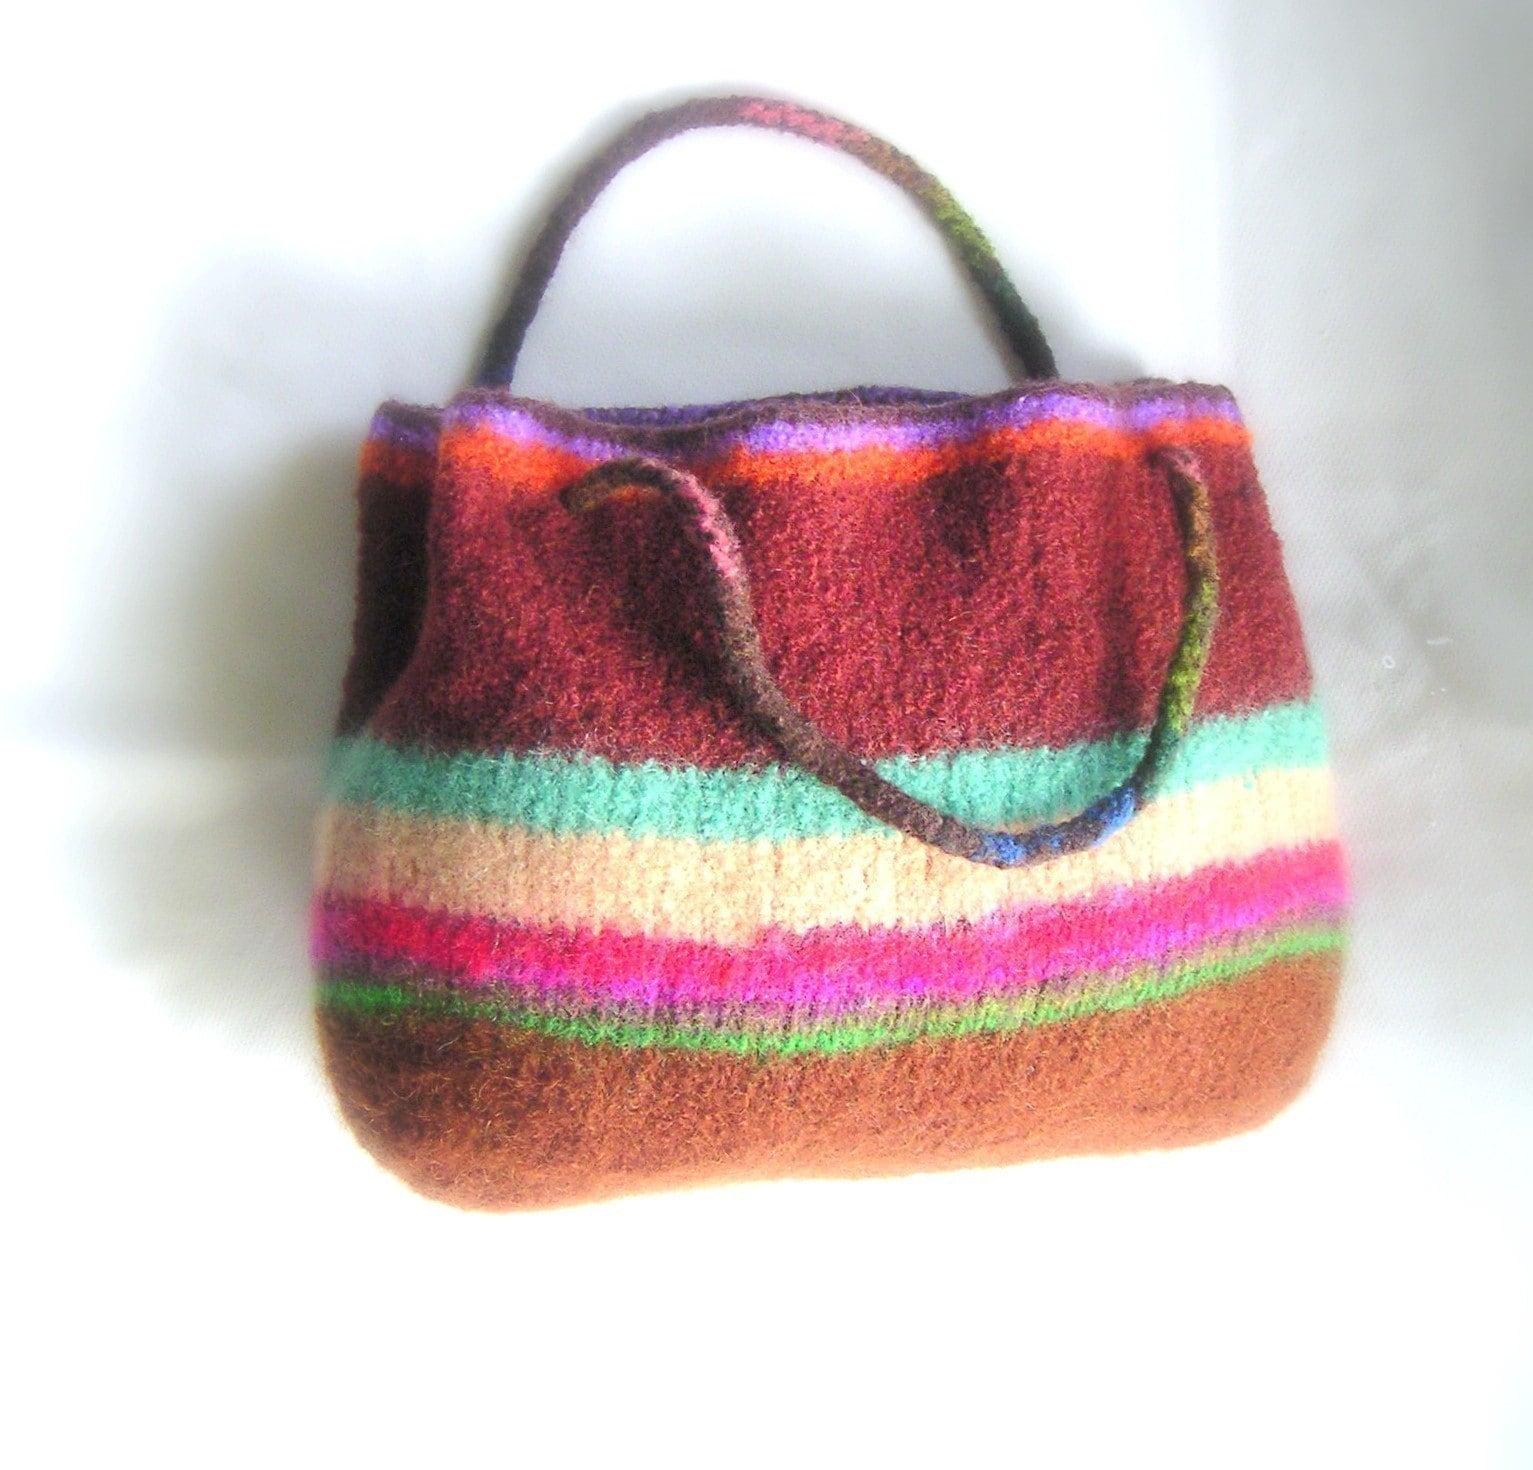 Knitted Mitten Patterns Free : Easy Knit Felted Pattern pdf Tote Bag by GraceKnittingPattern